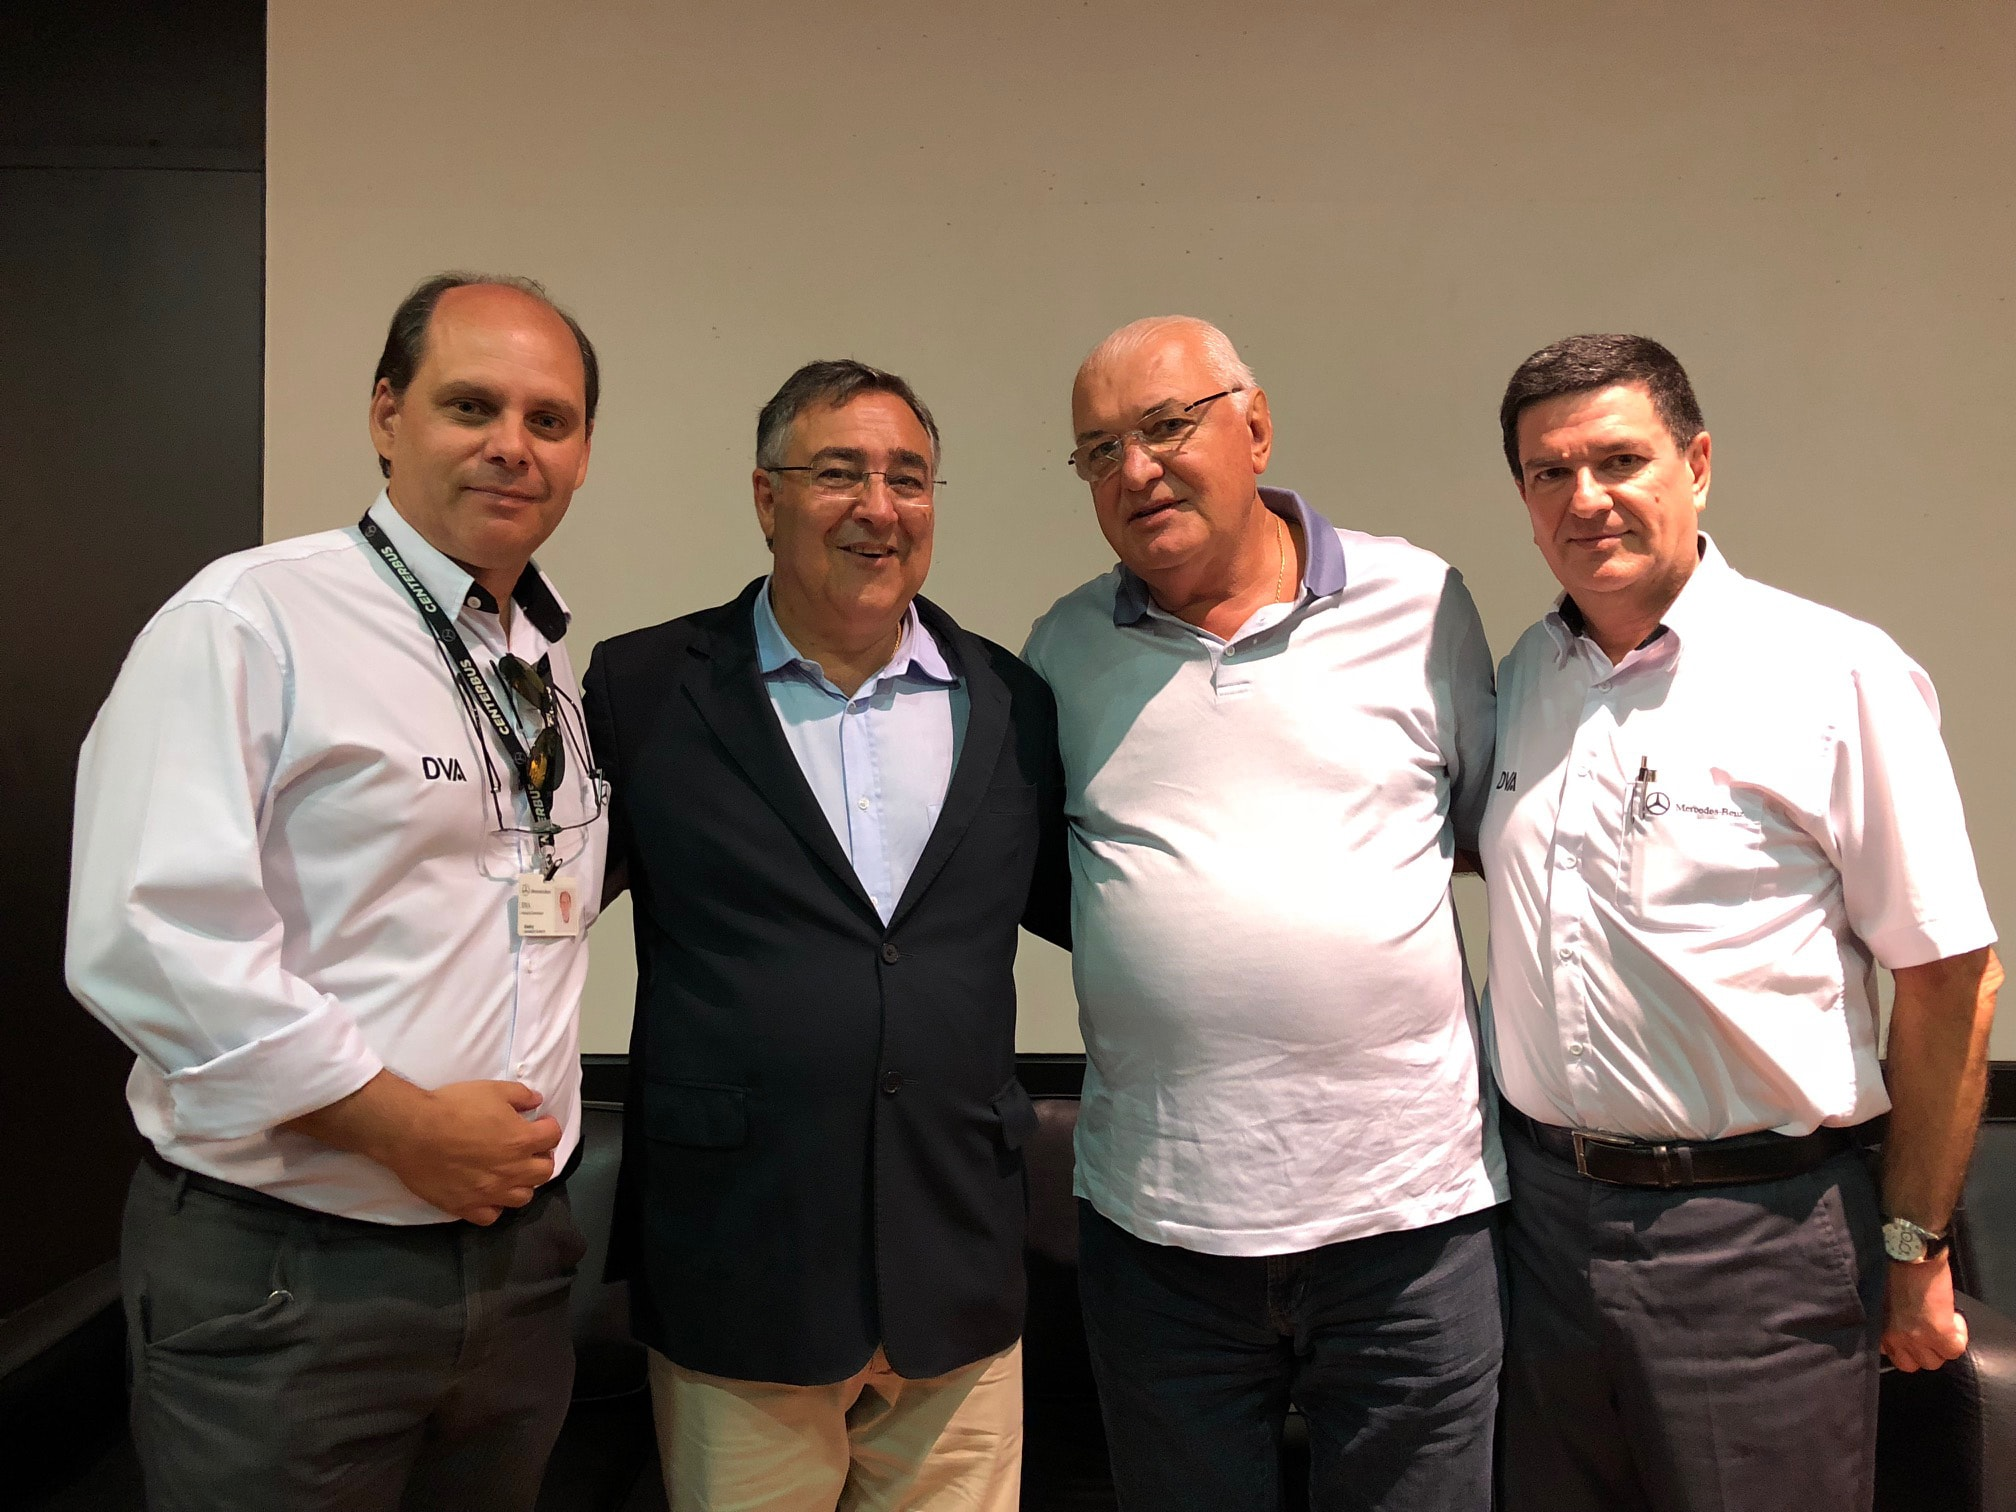 Angelito Godoy, Raimundo Colombo, Paulo Toniolo e Dirceu Rigotti 01-min.jpg